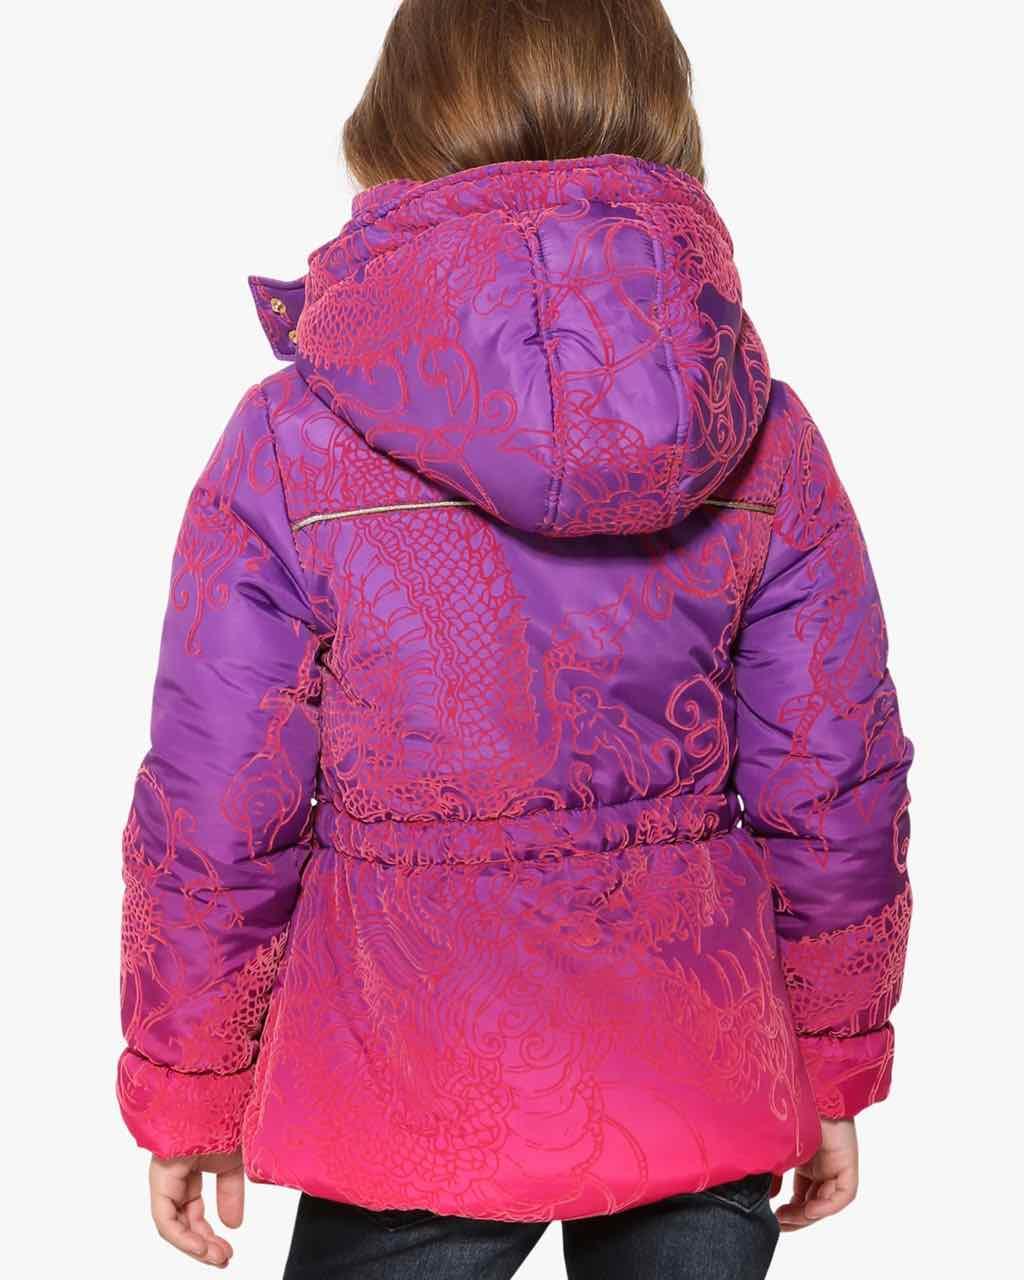 Desigual Girls Winter Coat Cardedeu 17wgew29 Purple Pink